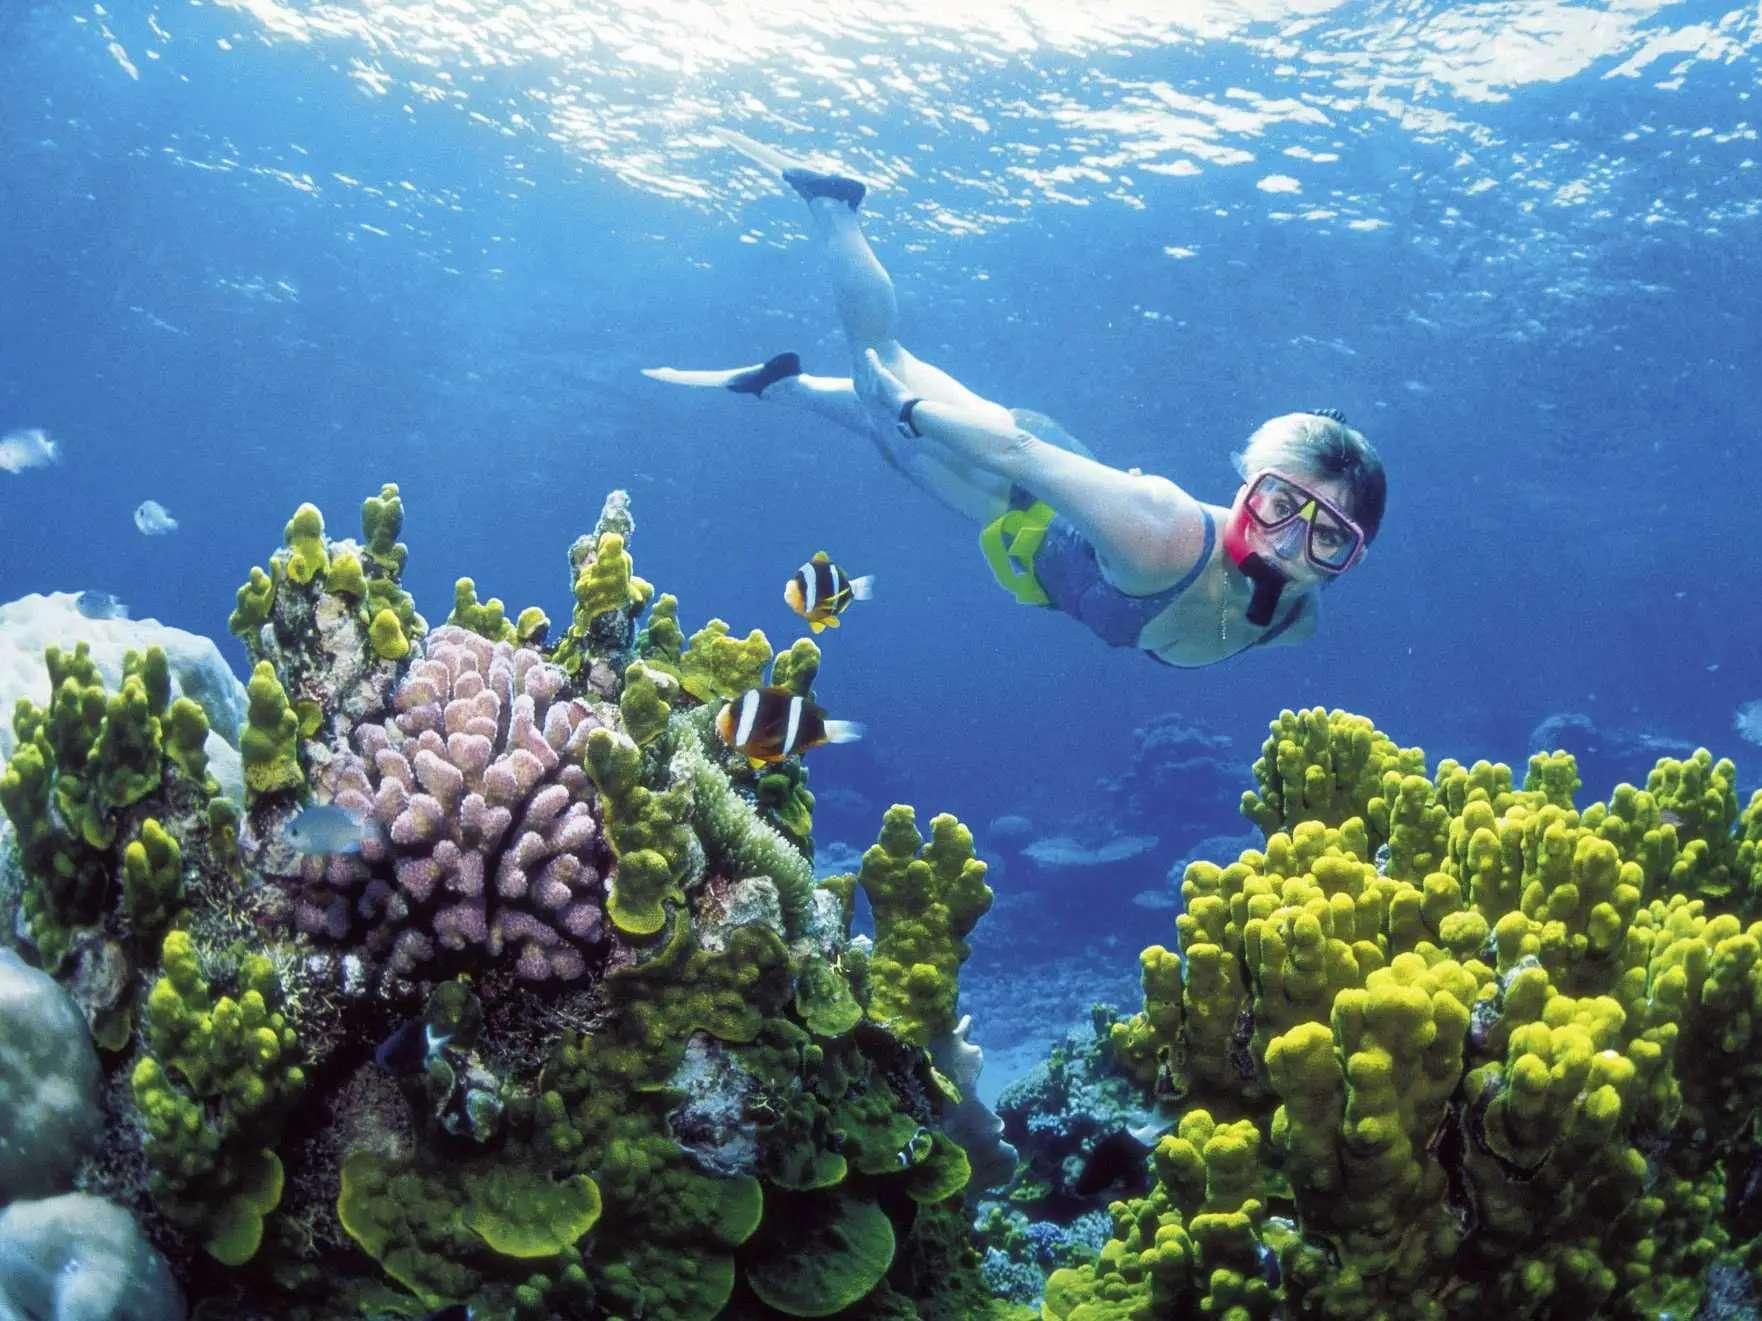 Go diving in Australia's UNESCO World Heritage Site, the Great Barrier Reef.